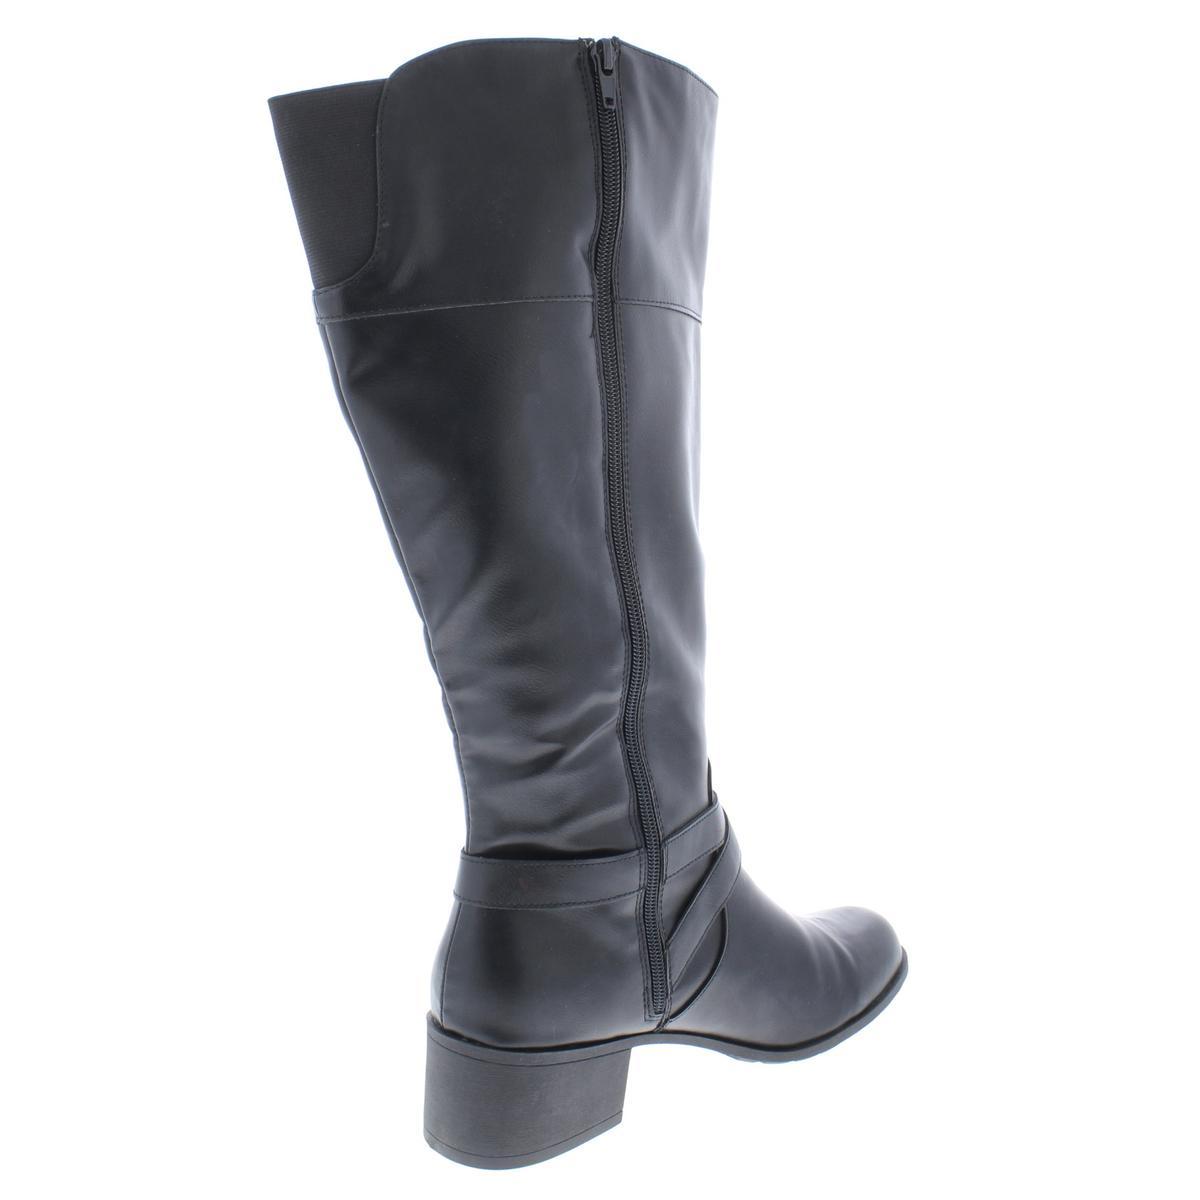 Style & Co. Damenschuhe Damenschuhe Damenschuhe Venesa Wide Calf Faux Leder Riding Stiefel Schuhes BHFO 9769 f698c7